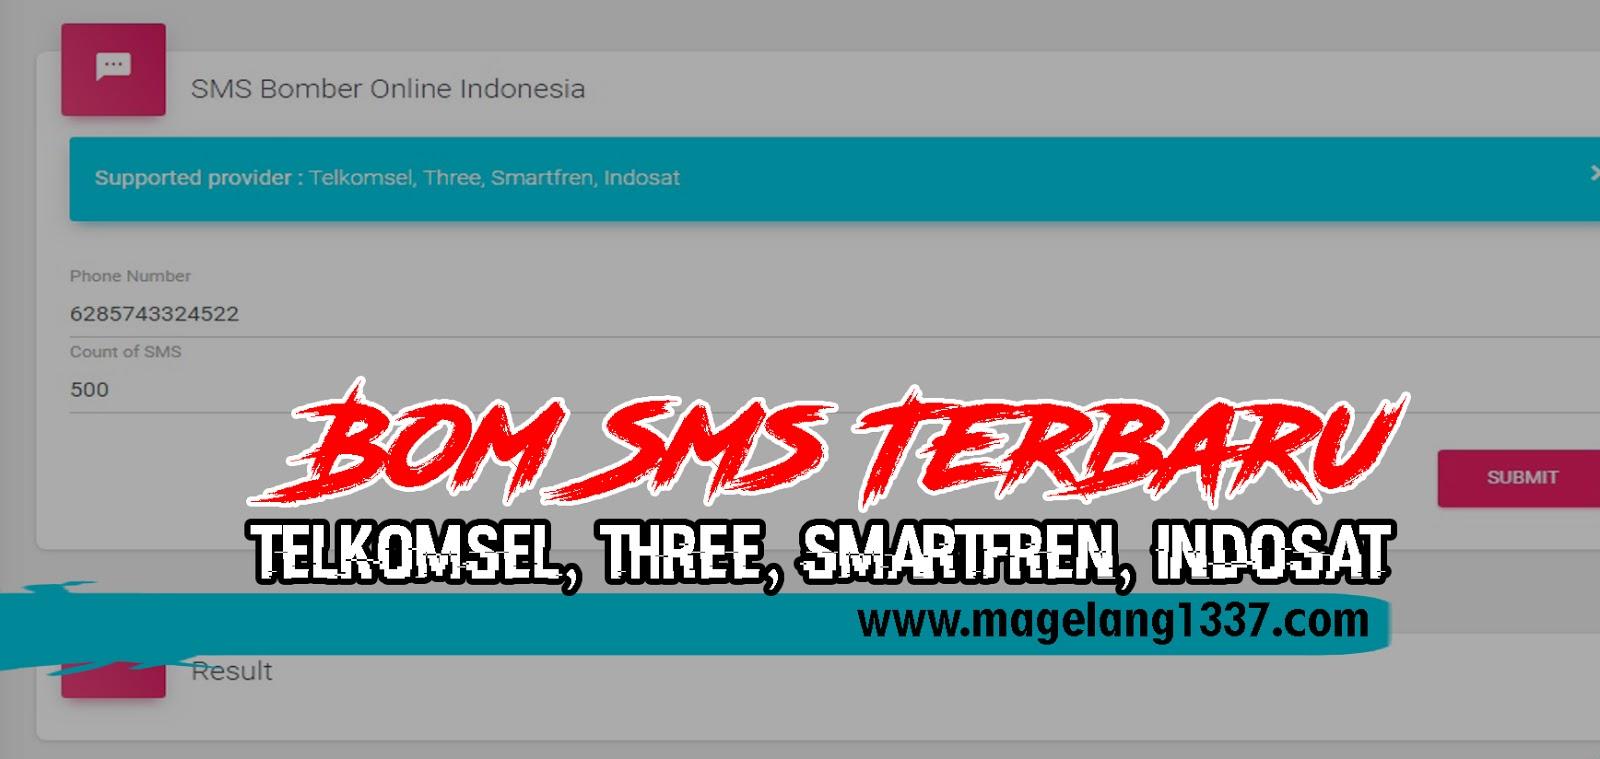 Bom Sms Terbaru 2019 [ Telkomsel, Three, Smartfren, Indosat ] - MNH-BLOG